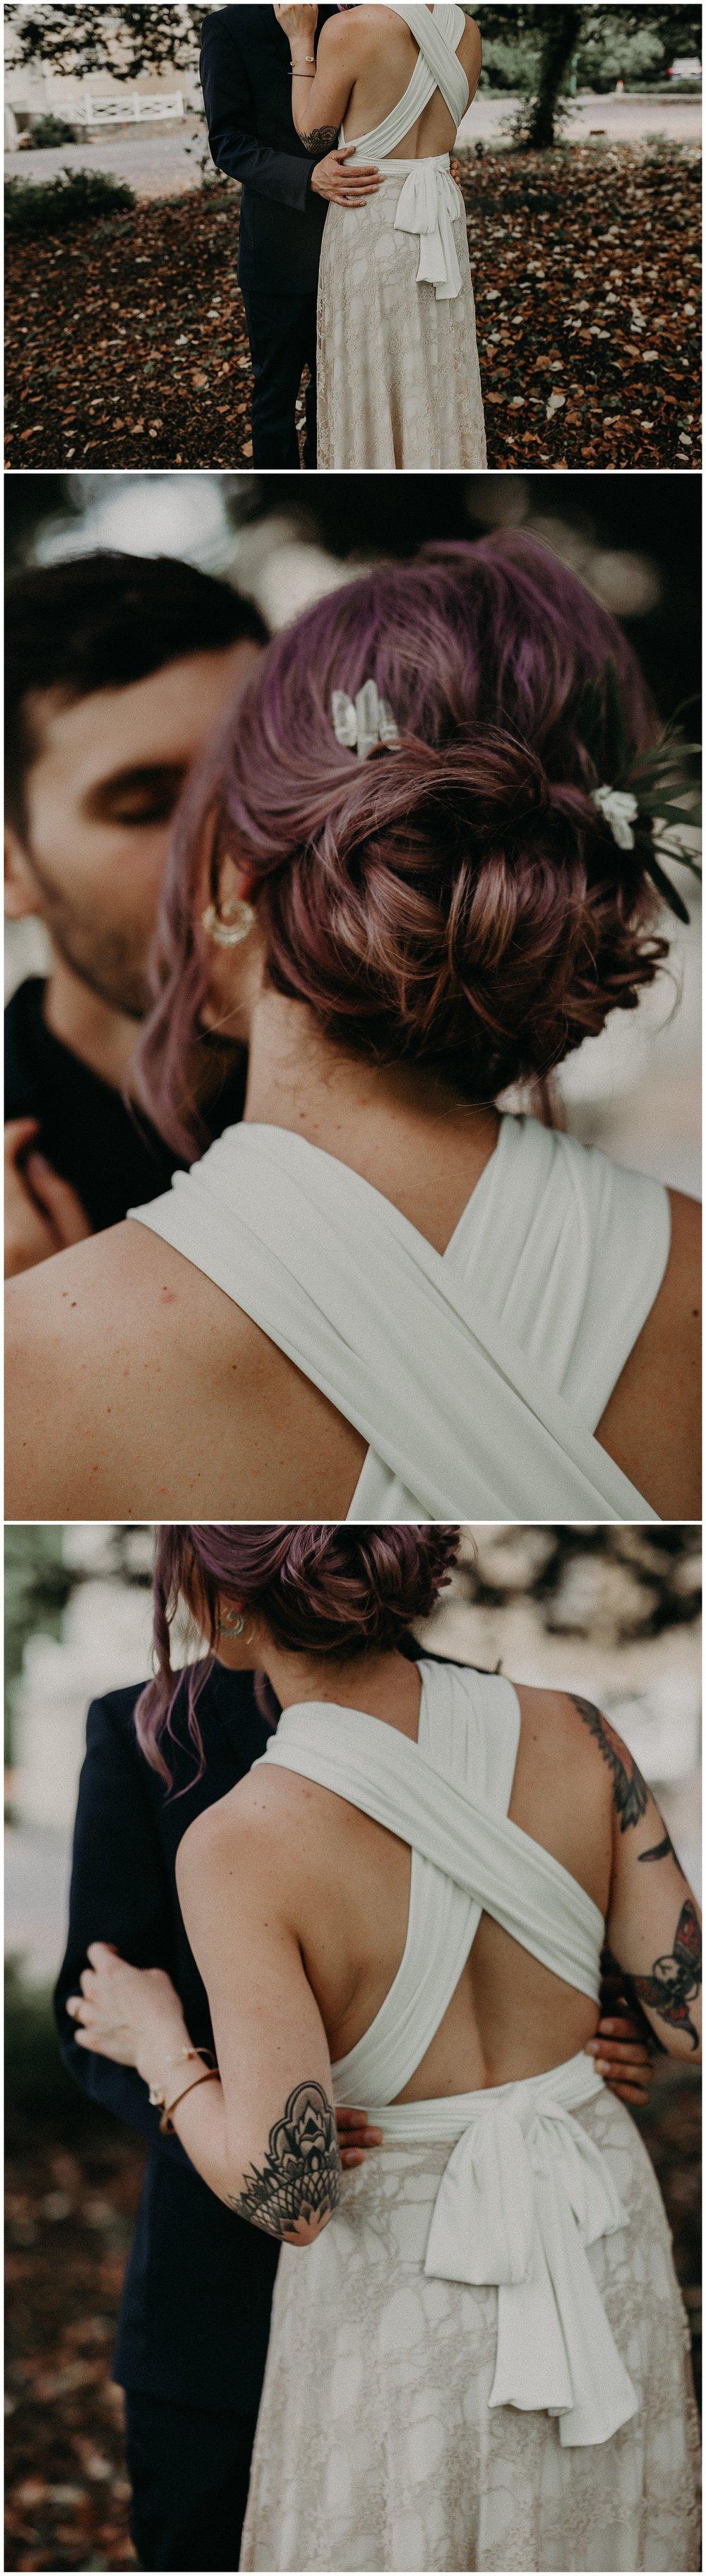 Outdoor Summer Boho Wedding at Ridgeland Manion in Downtown Philadelphia Pennsylvania_0083.jpg